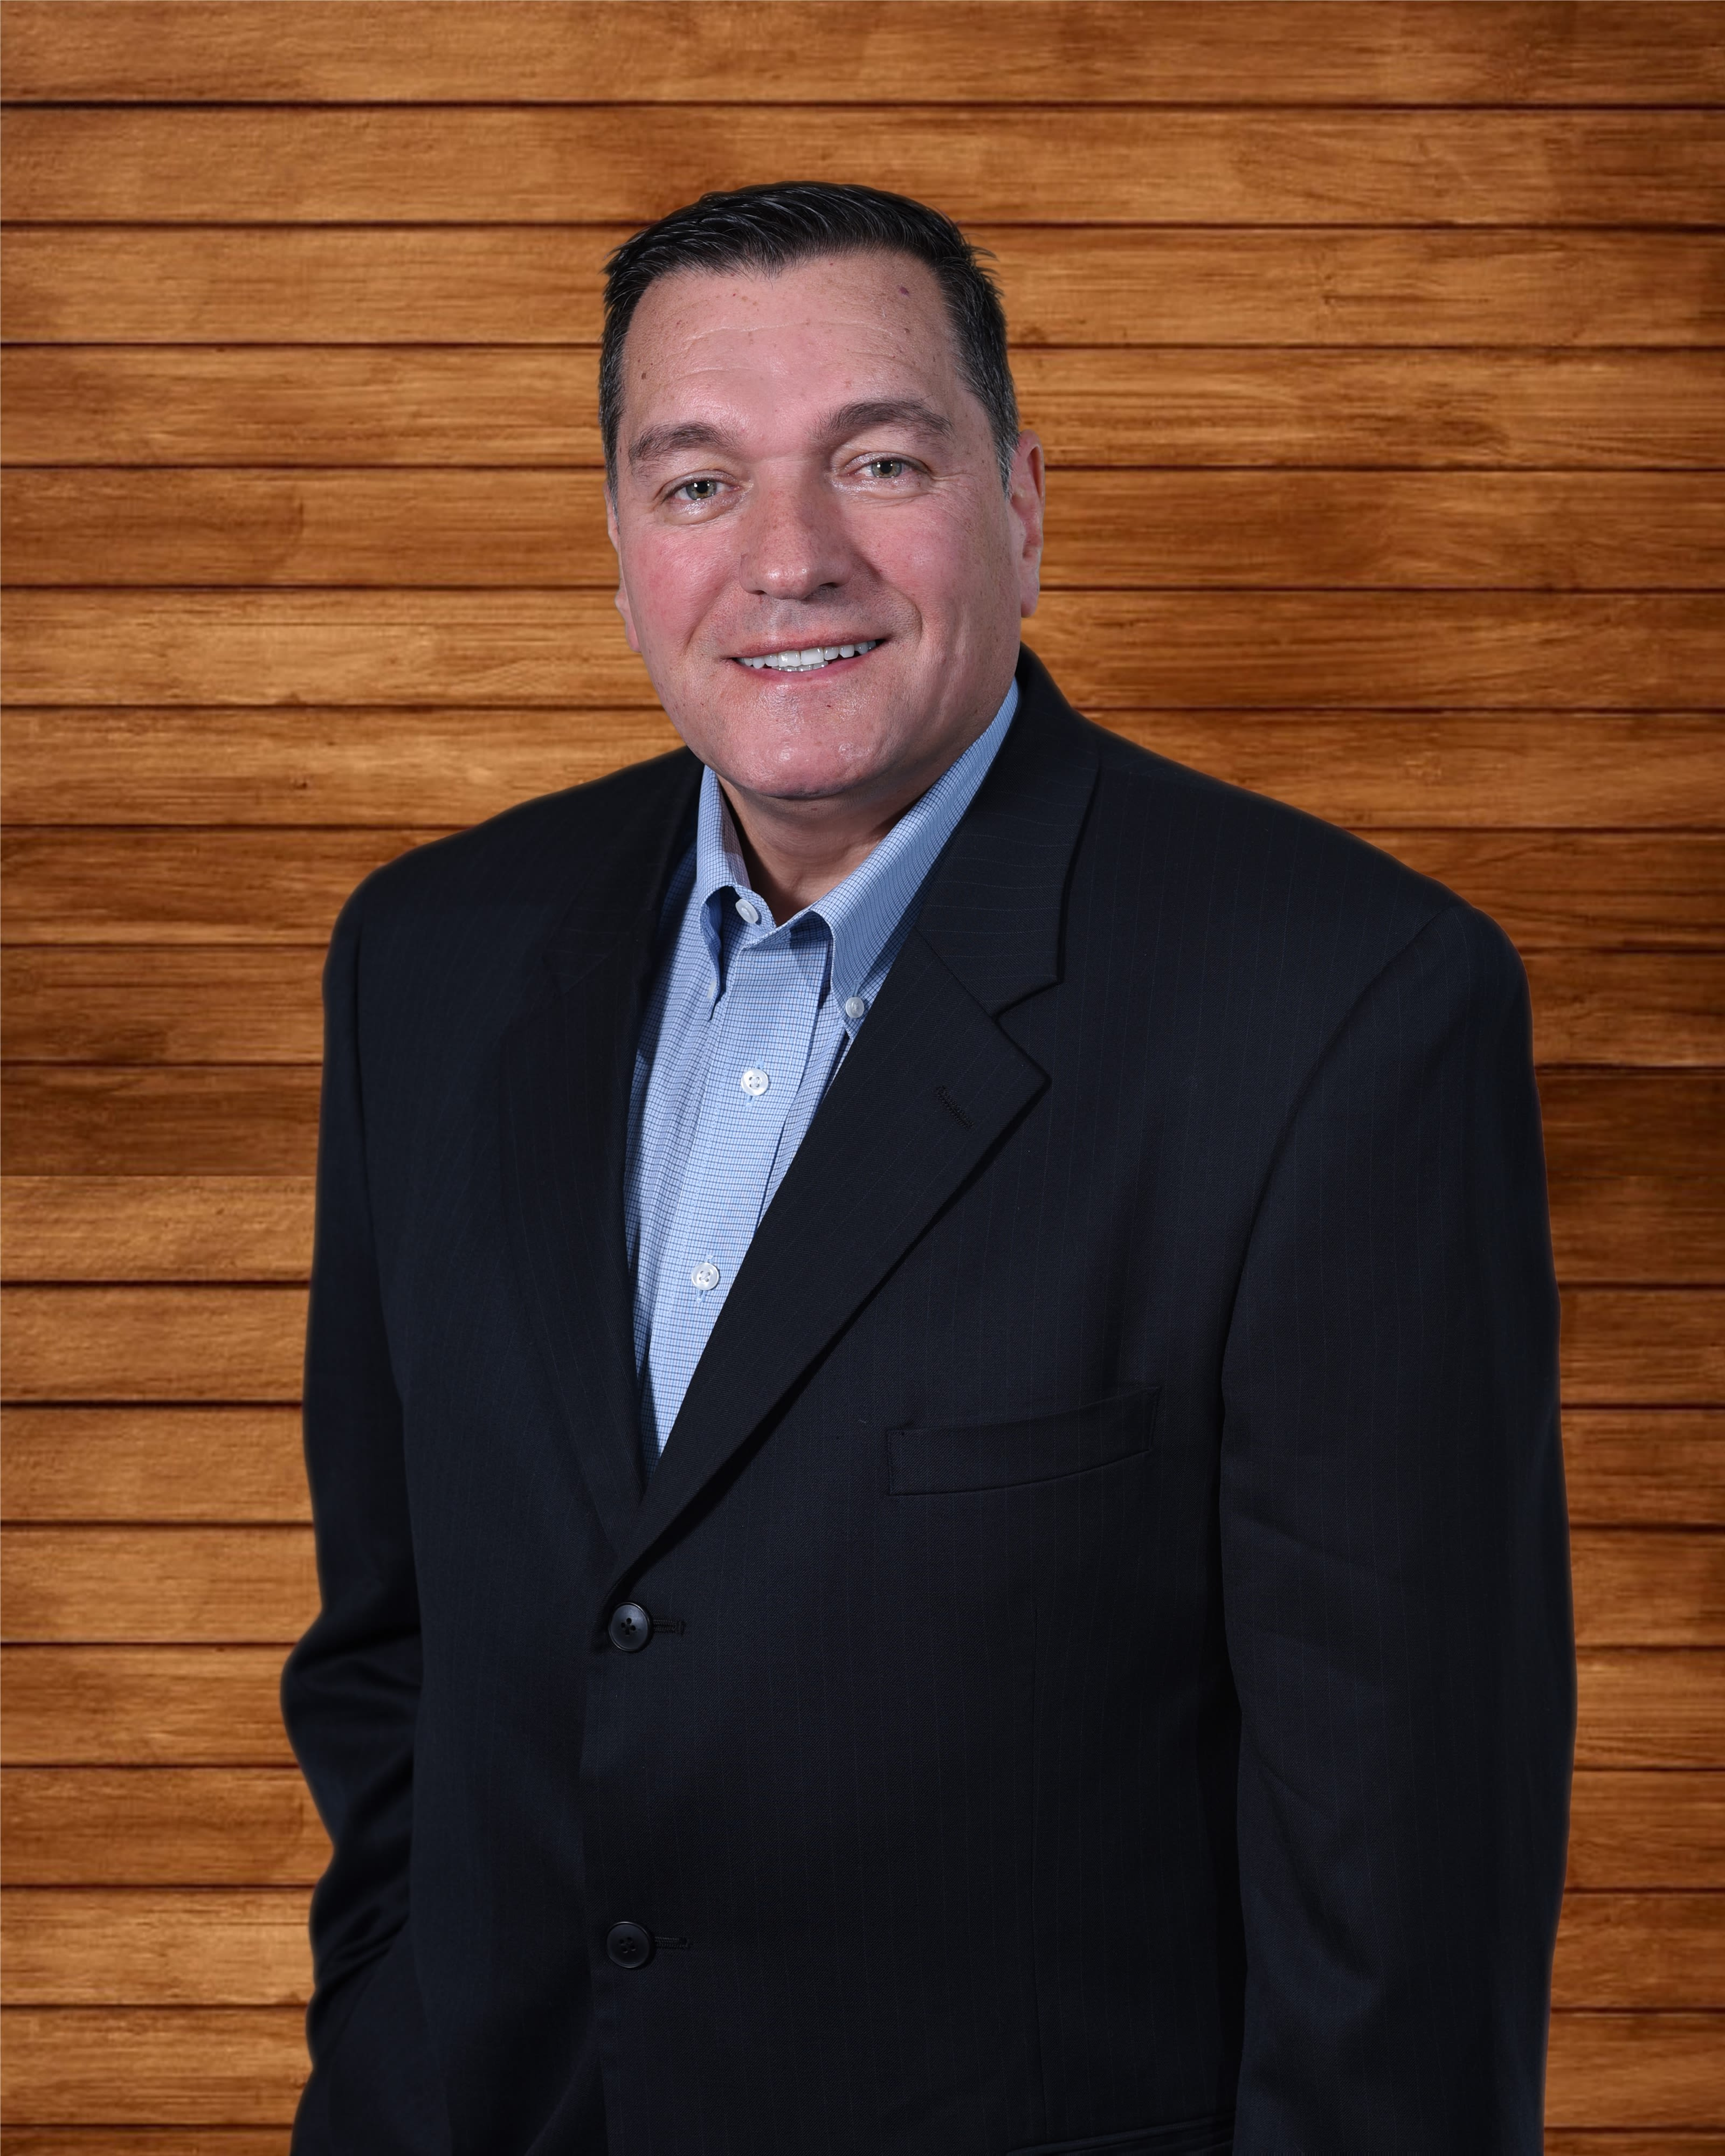 George Draghiceanu, Executive Vice President at Elegance Living, LLC